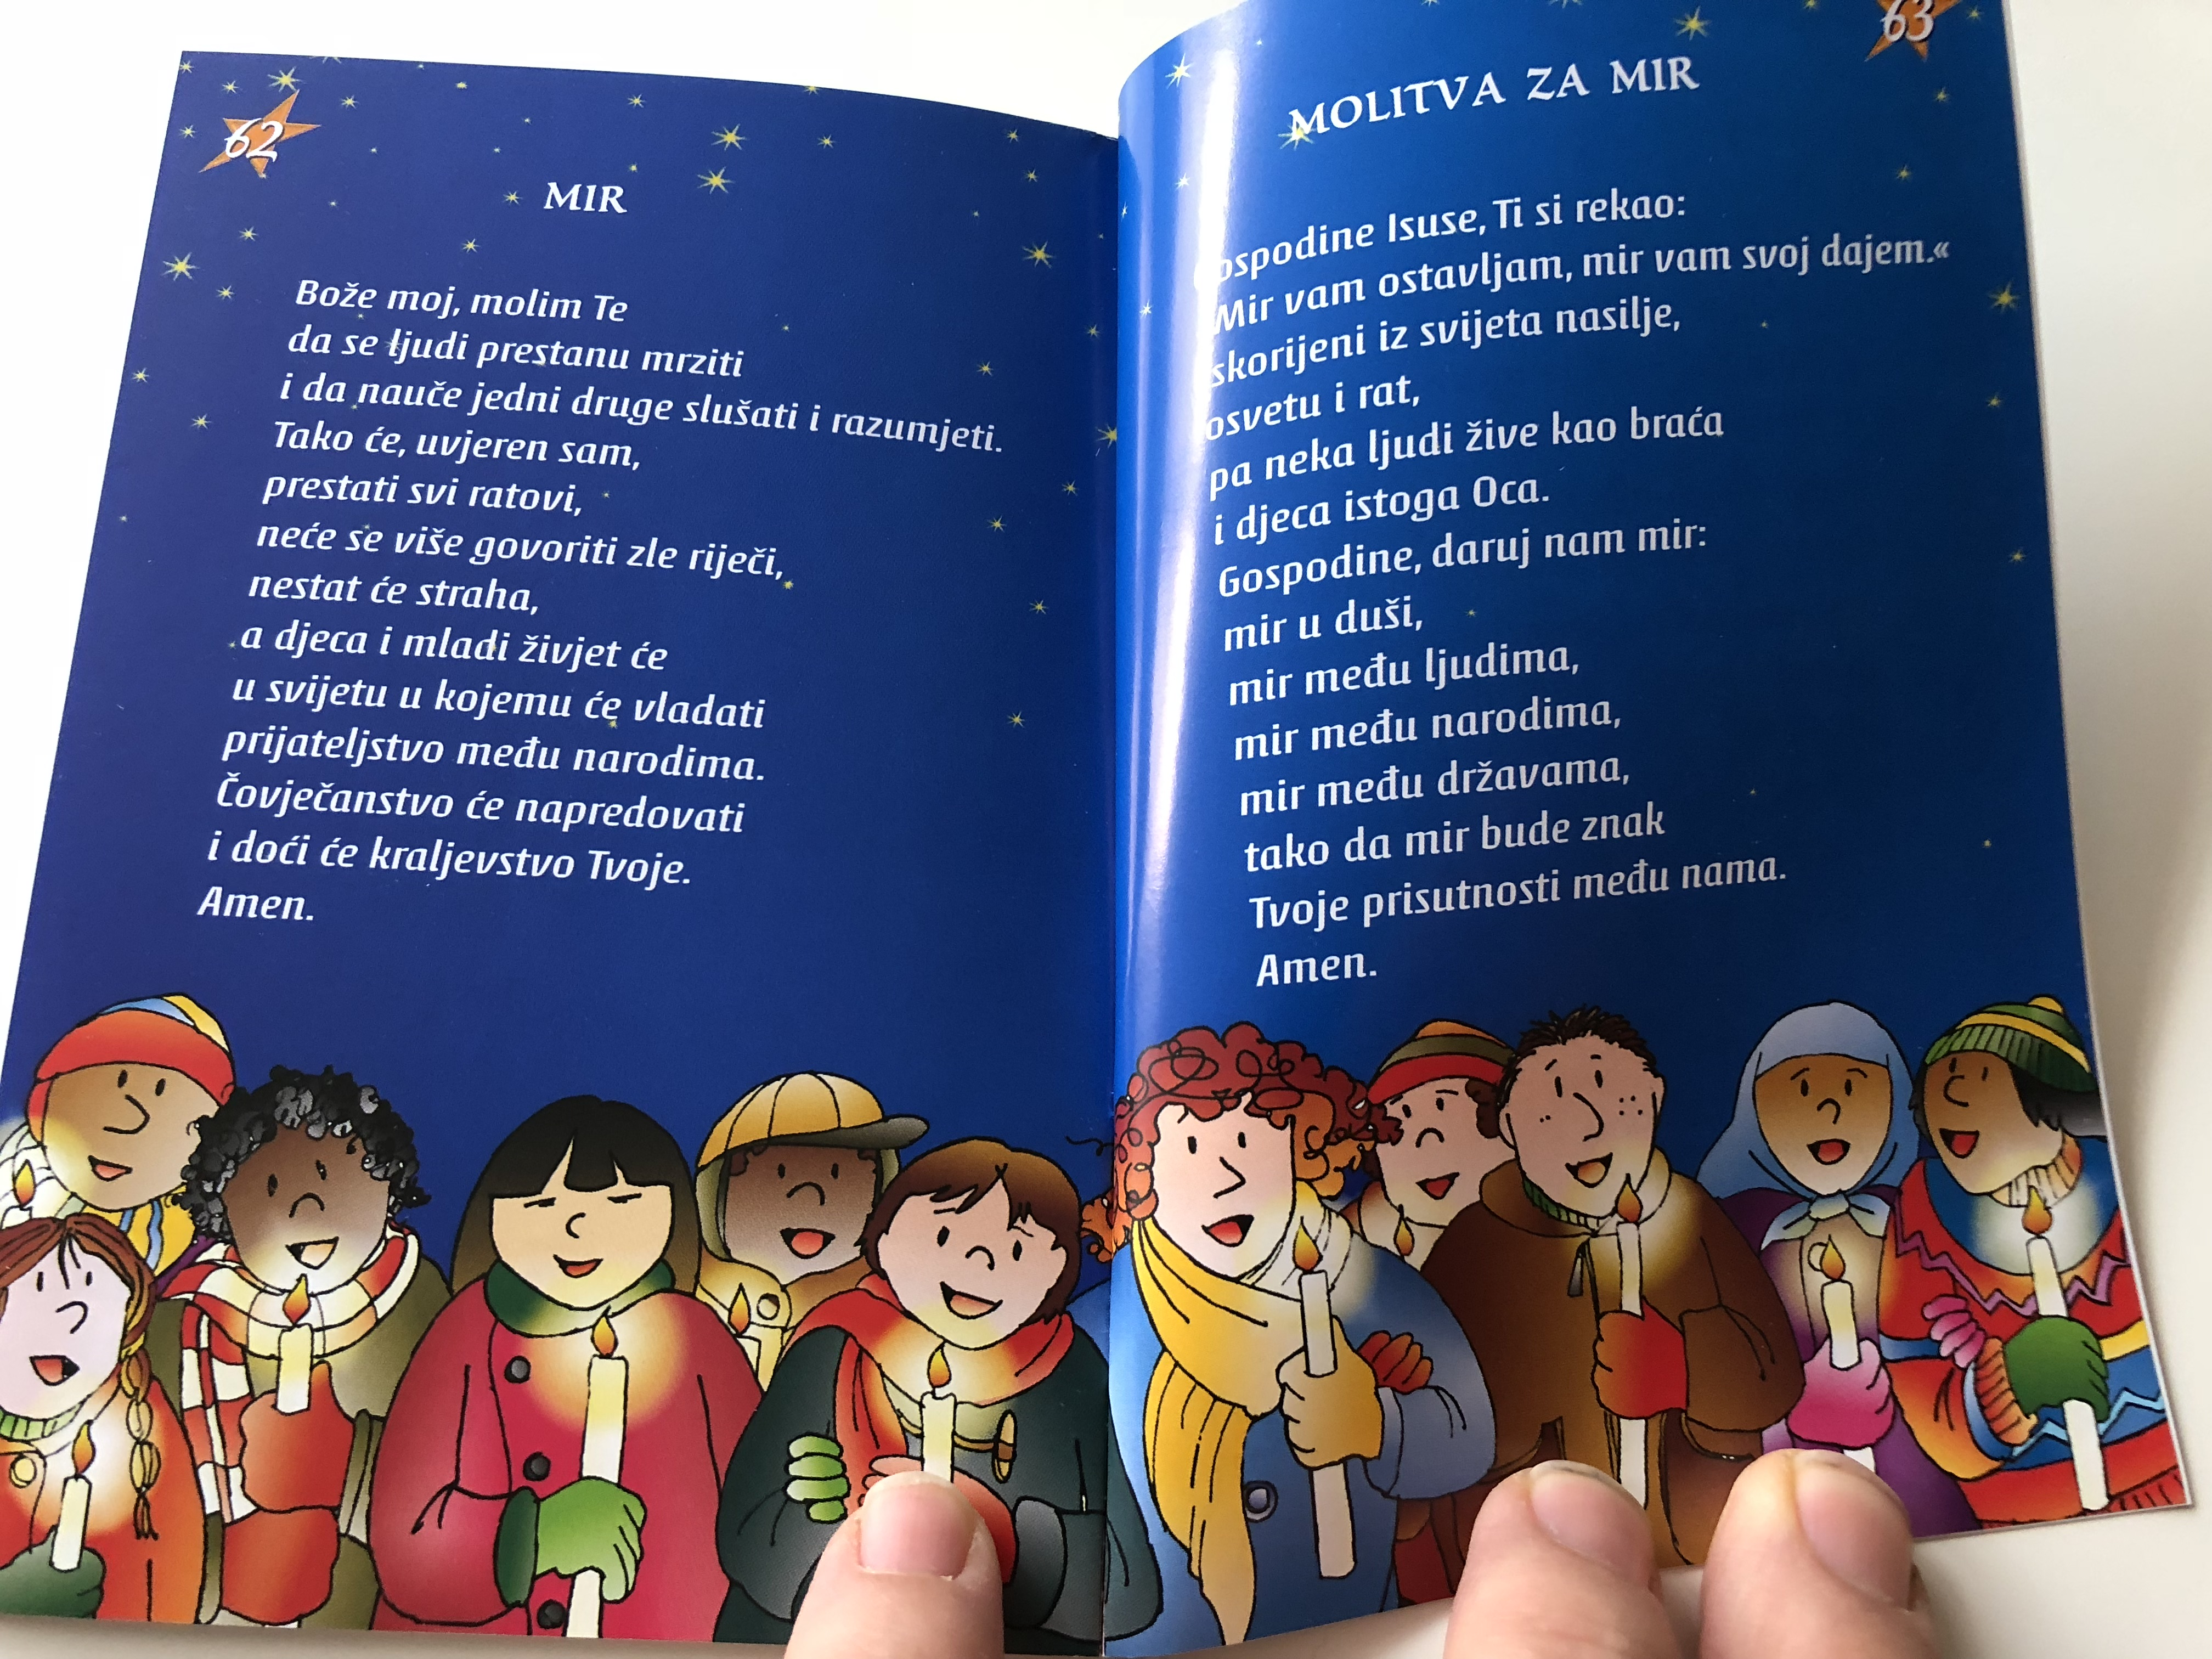 gospodine-prijatelju-moj-lord-my-friend-my-little-prayerbook-croatian-language-edition-of-signore-amico-mio-9-.jpg